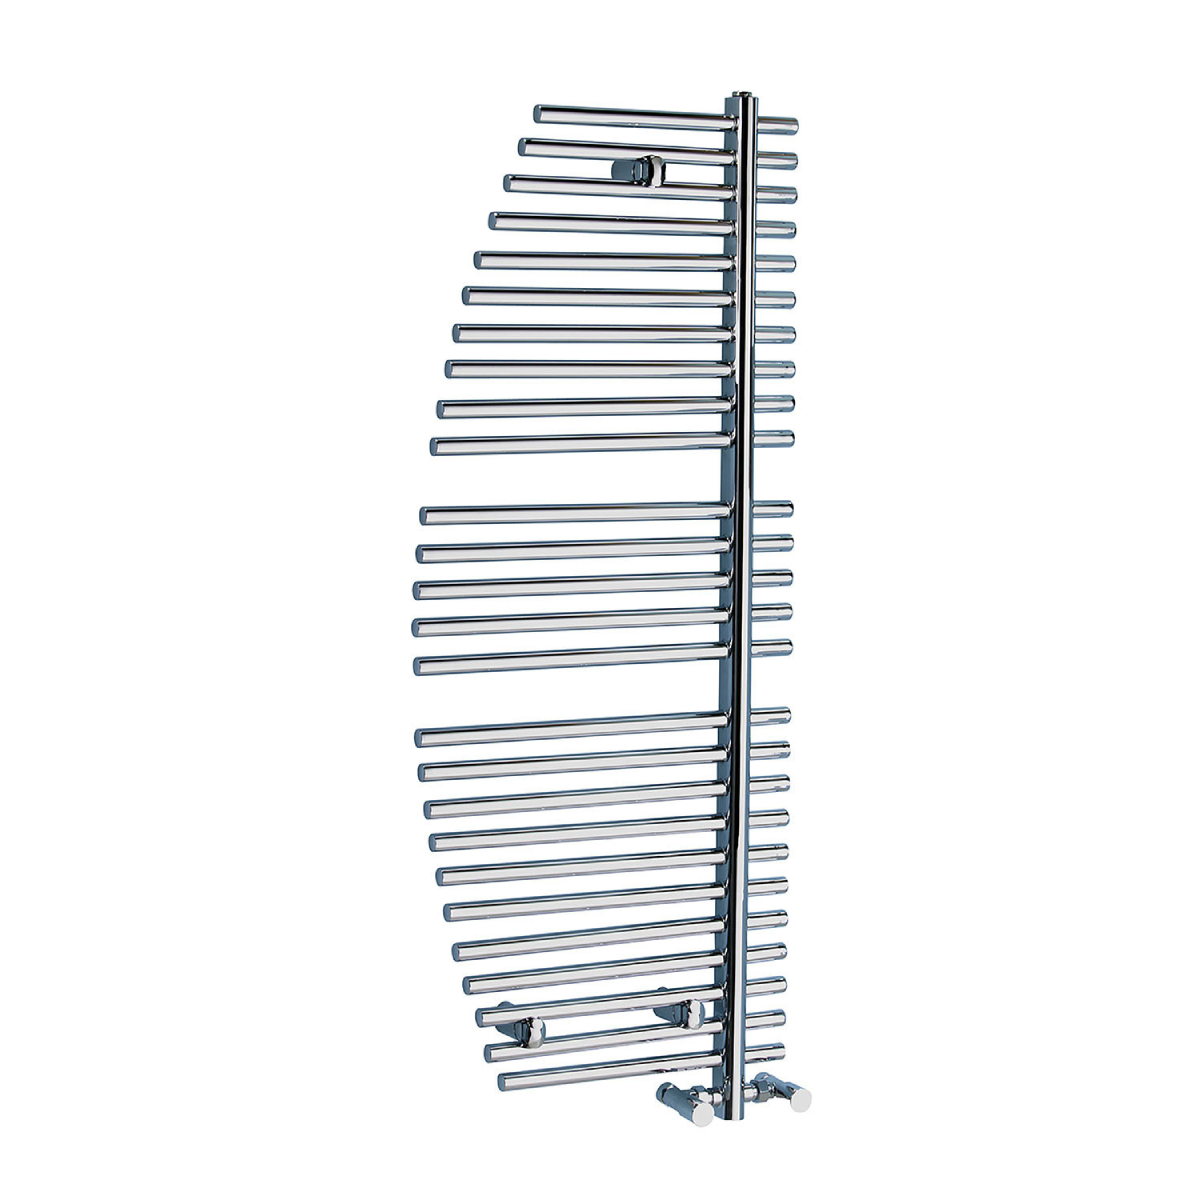 Frontline Burj Chrome Heated Towel Rail With 3 Geometric Hanging Areas W470 H900